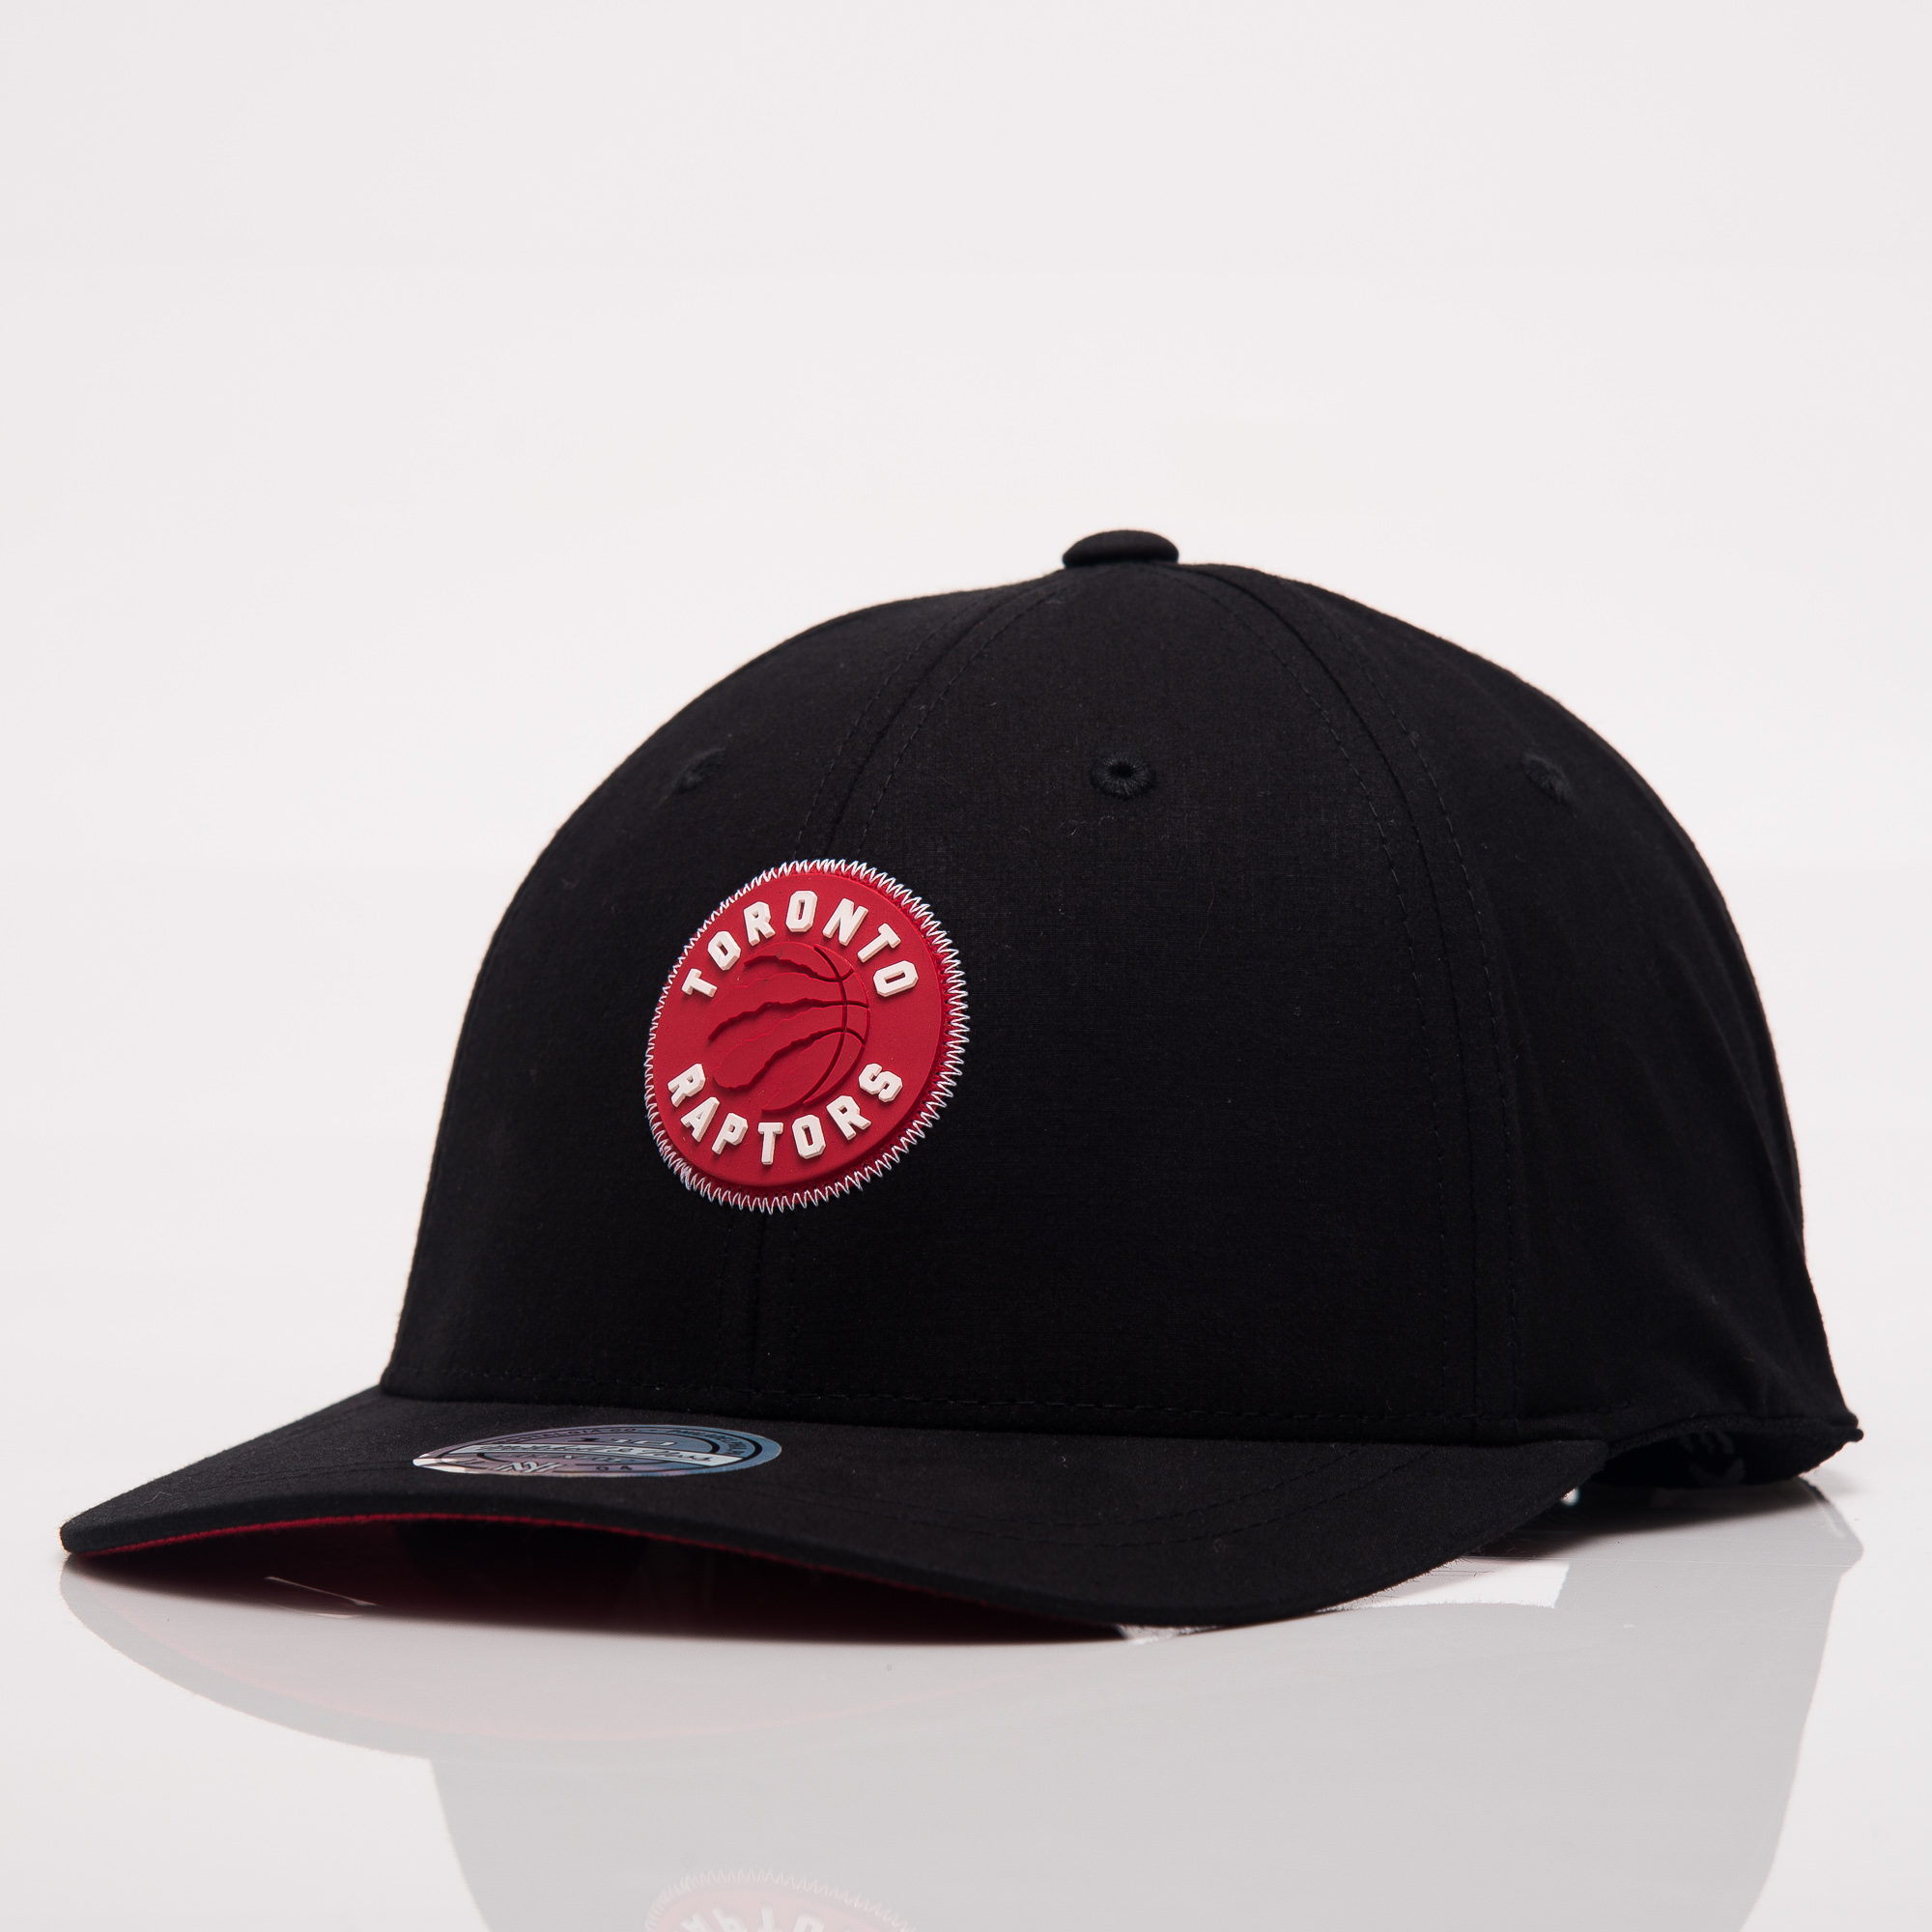 0a9d3e311b72af Mitchell Ness NBA Toronto Raptors Biowashed Zig Zag Snapback Cap - NBA Shop Toronto  Raptors Merchandise - Superfanas.lt